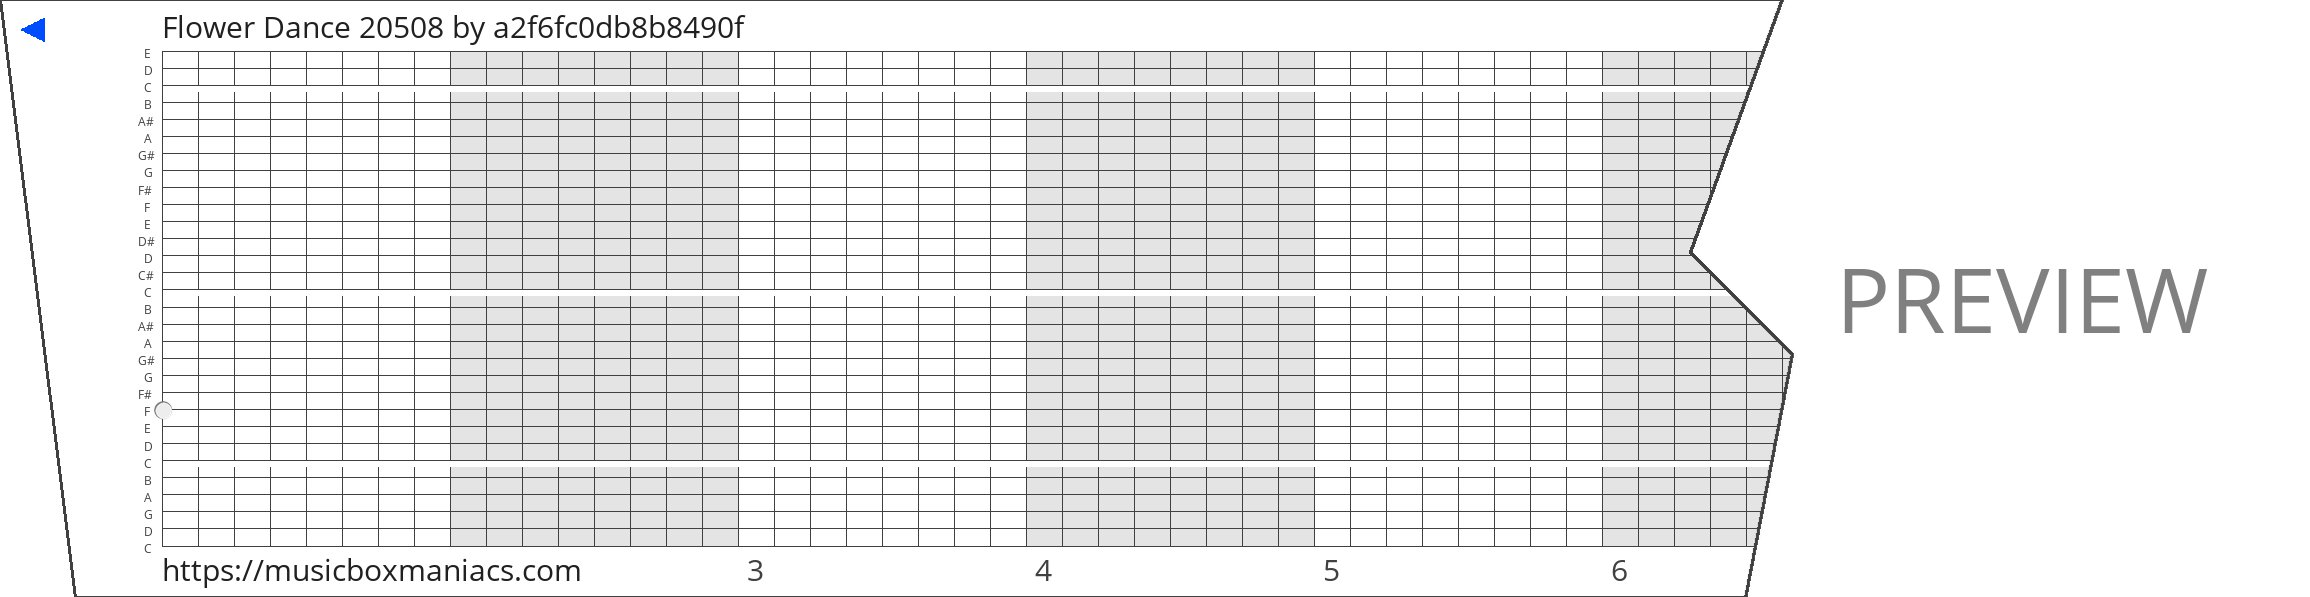 Flower Dance 20508 30 note music box paper strip